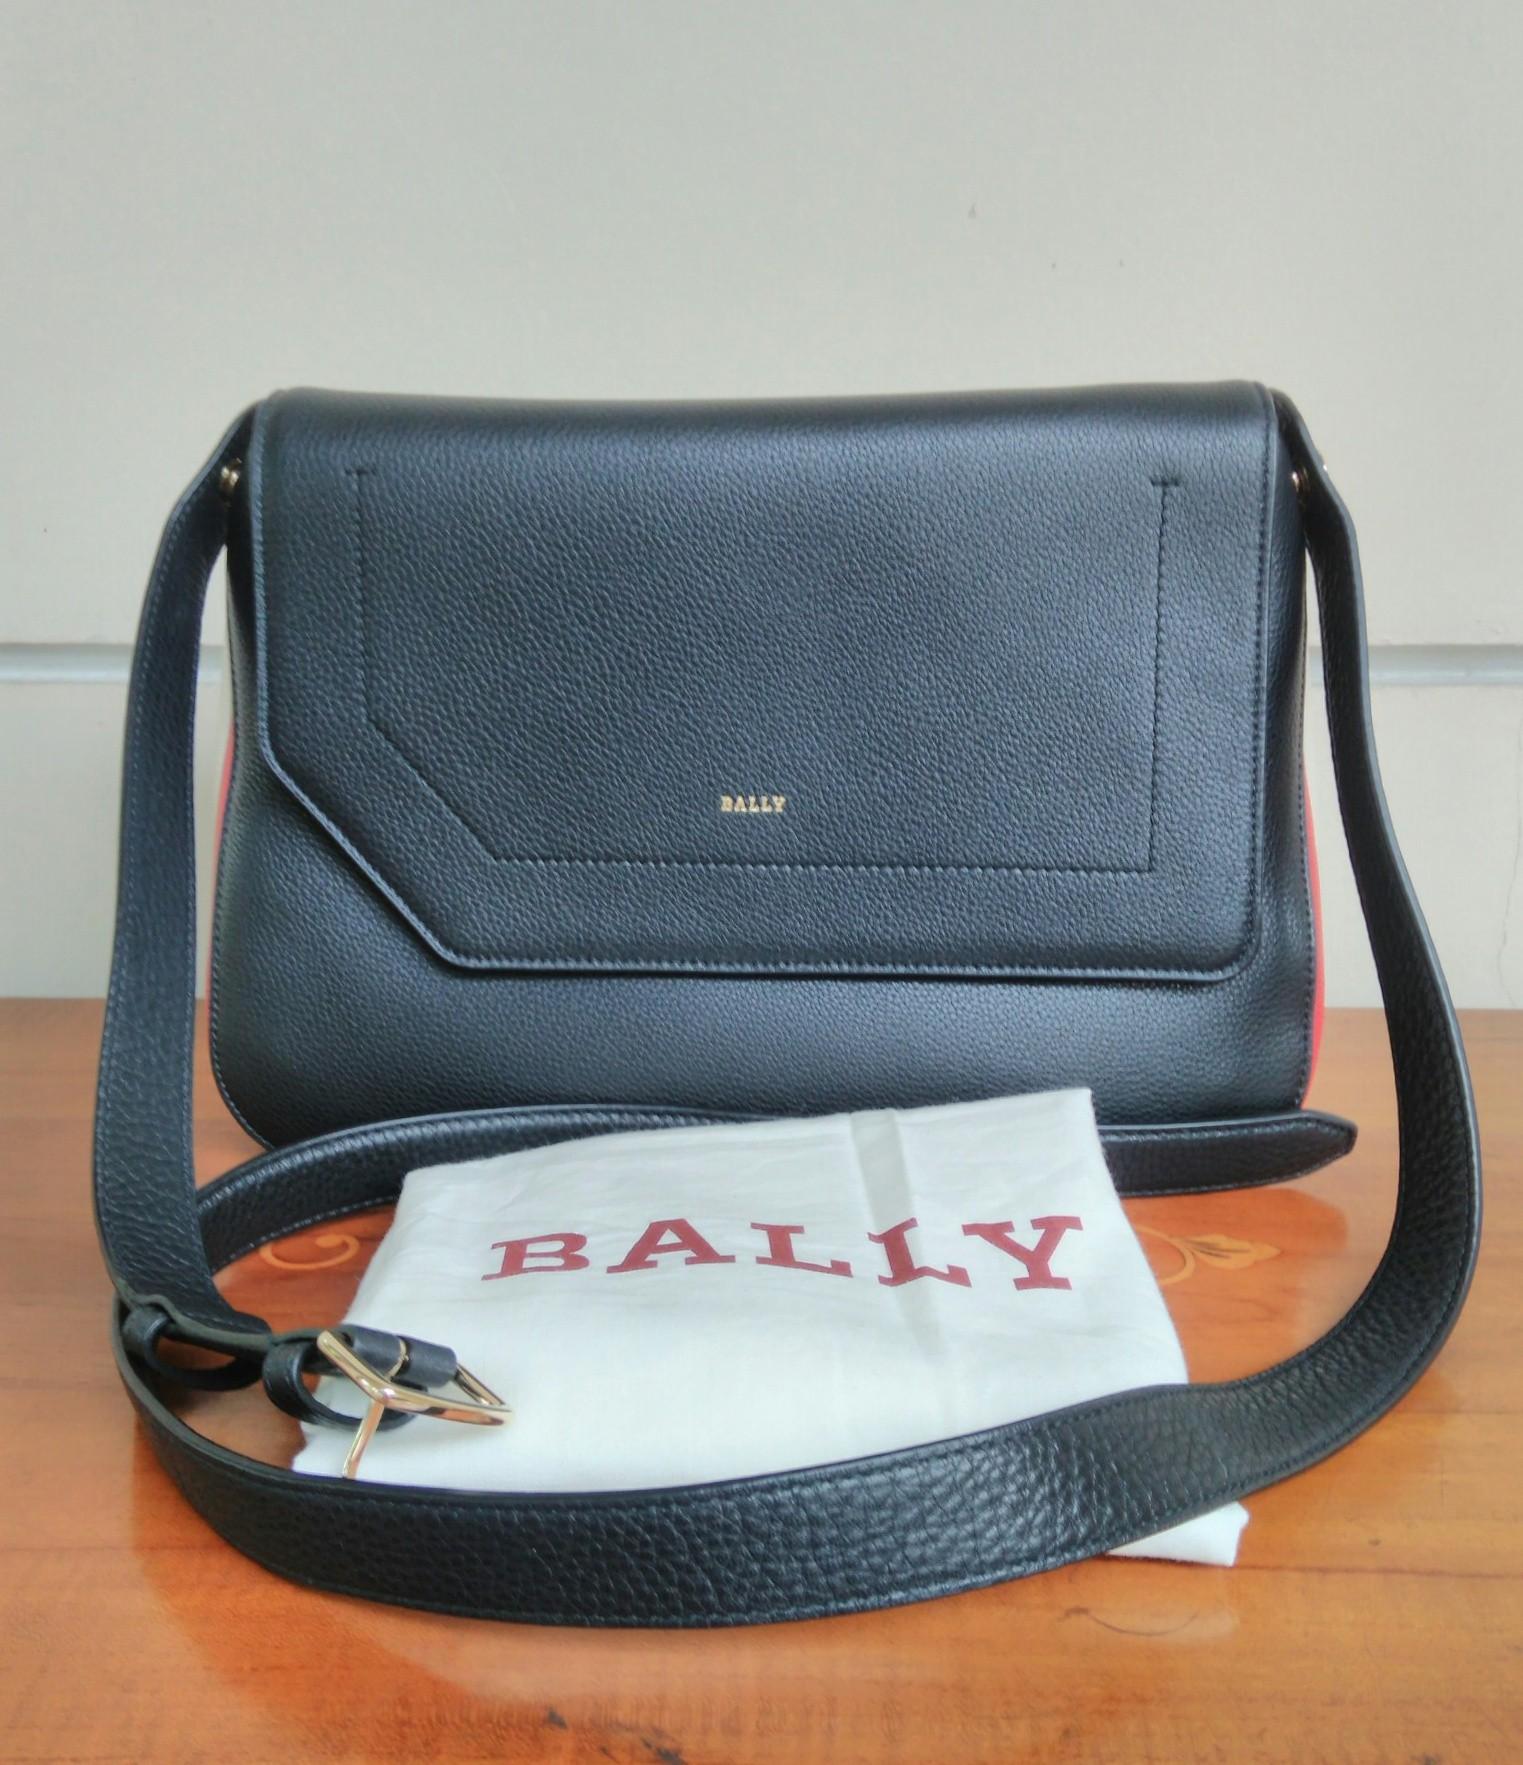 563ad4c234ad Prebu.com    Handbags    Bally Black Bovine Grained